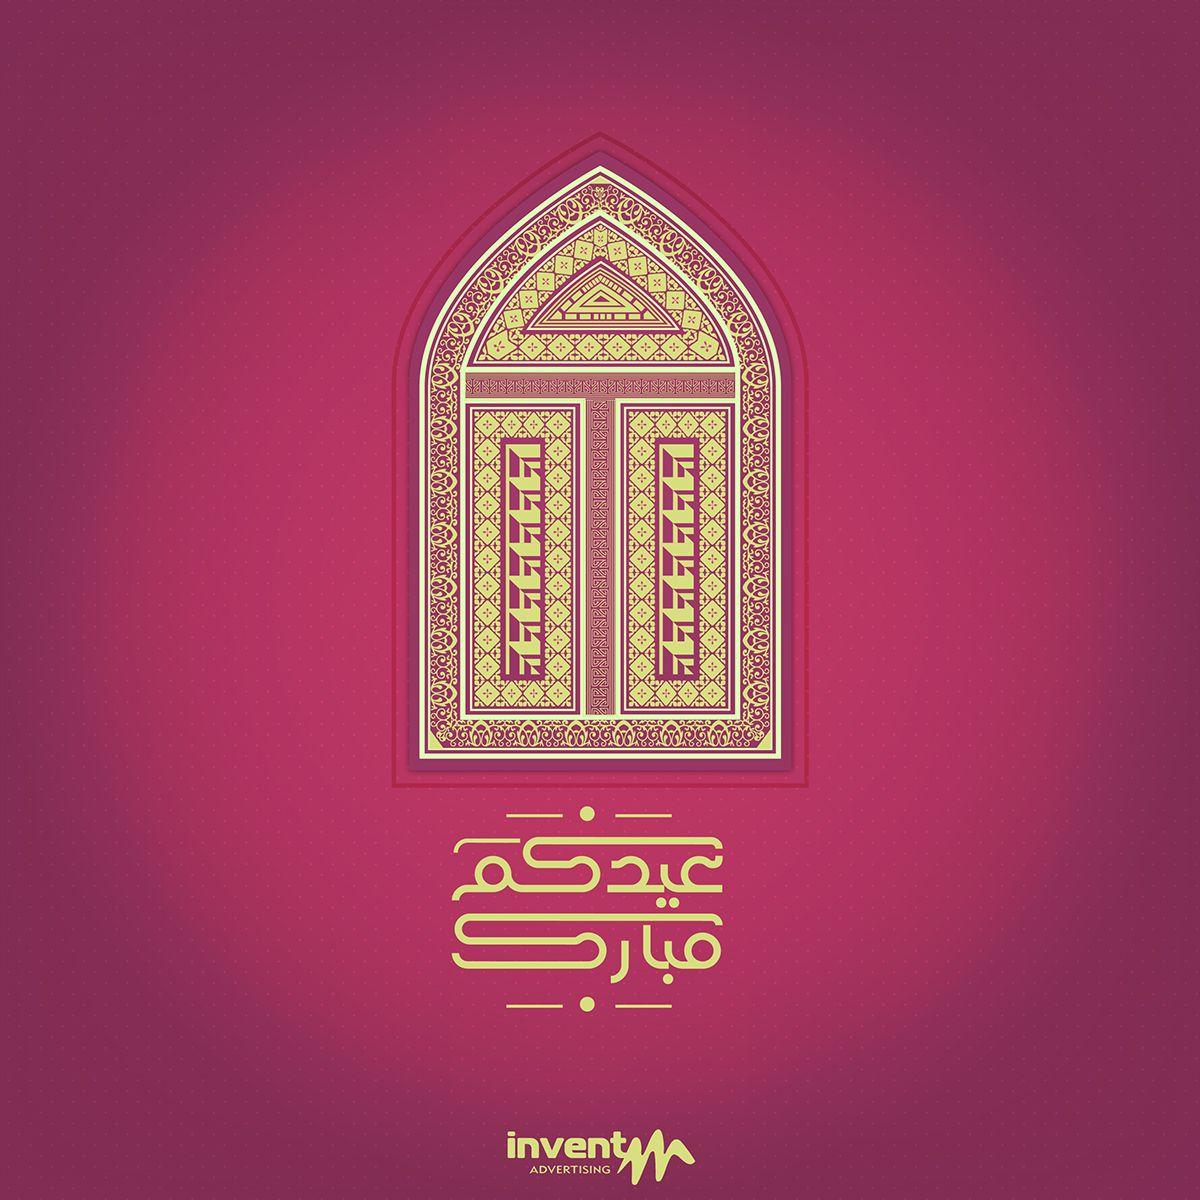 Eid mubarak greetings card on behance banners pinterest eid eid mubarak wishes quotes in english greeting cards images 2017 kristyandbryce Choice Image